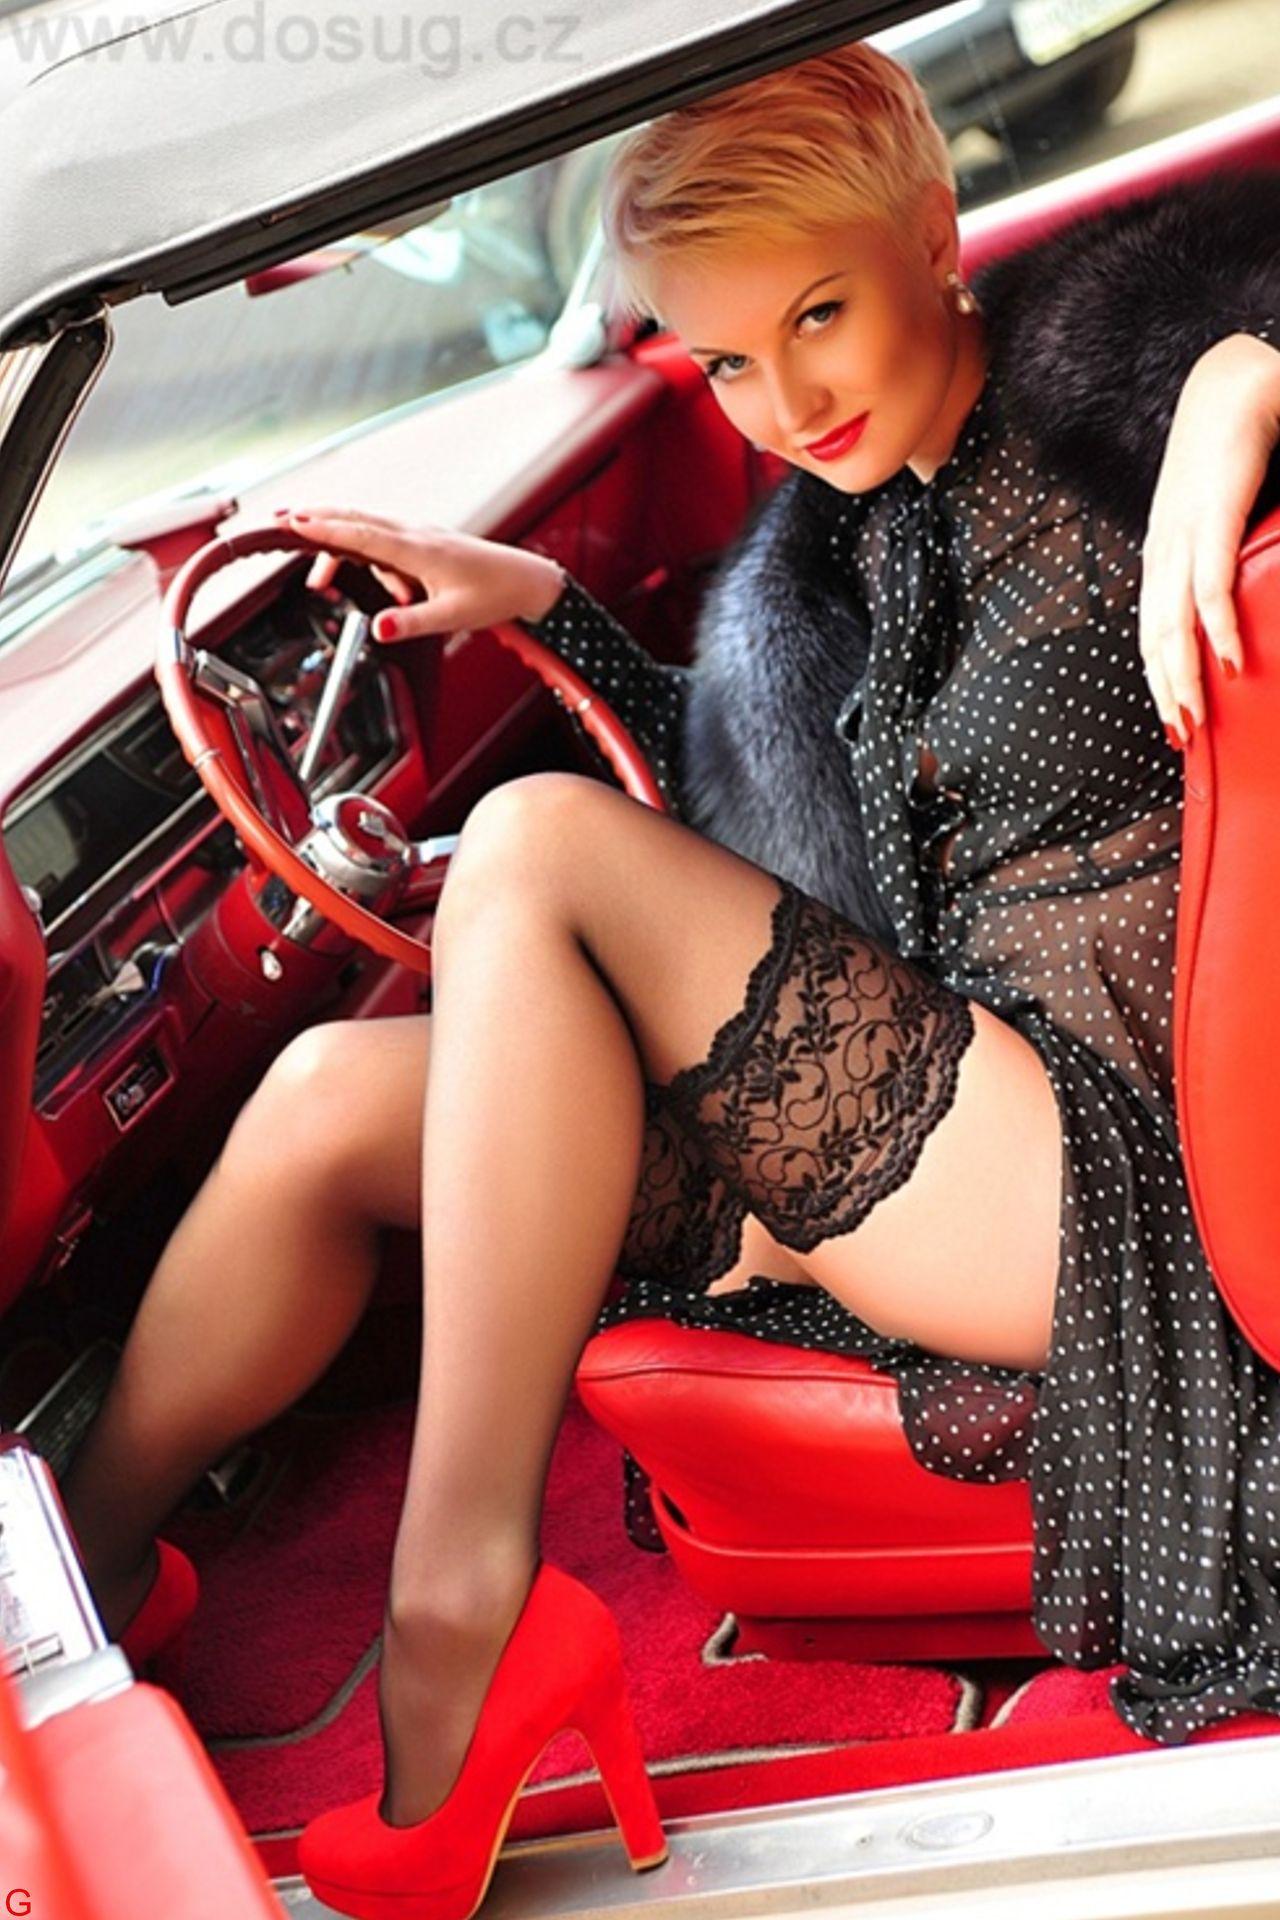 lowrider models wearing stockings